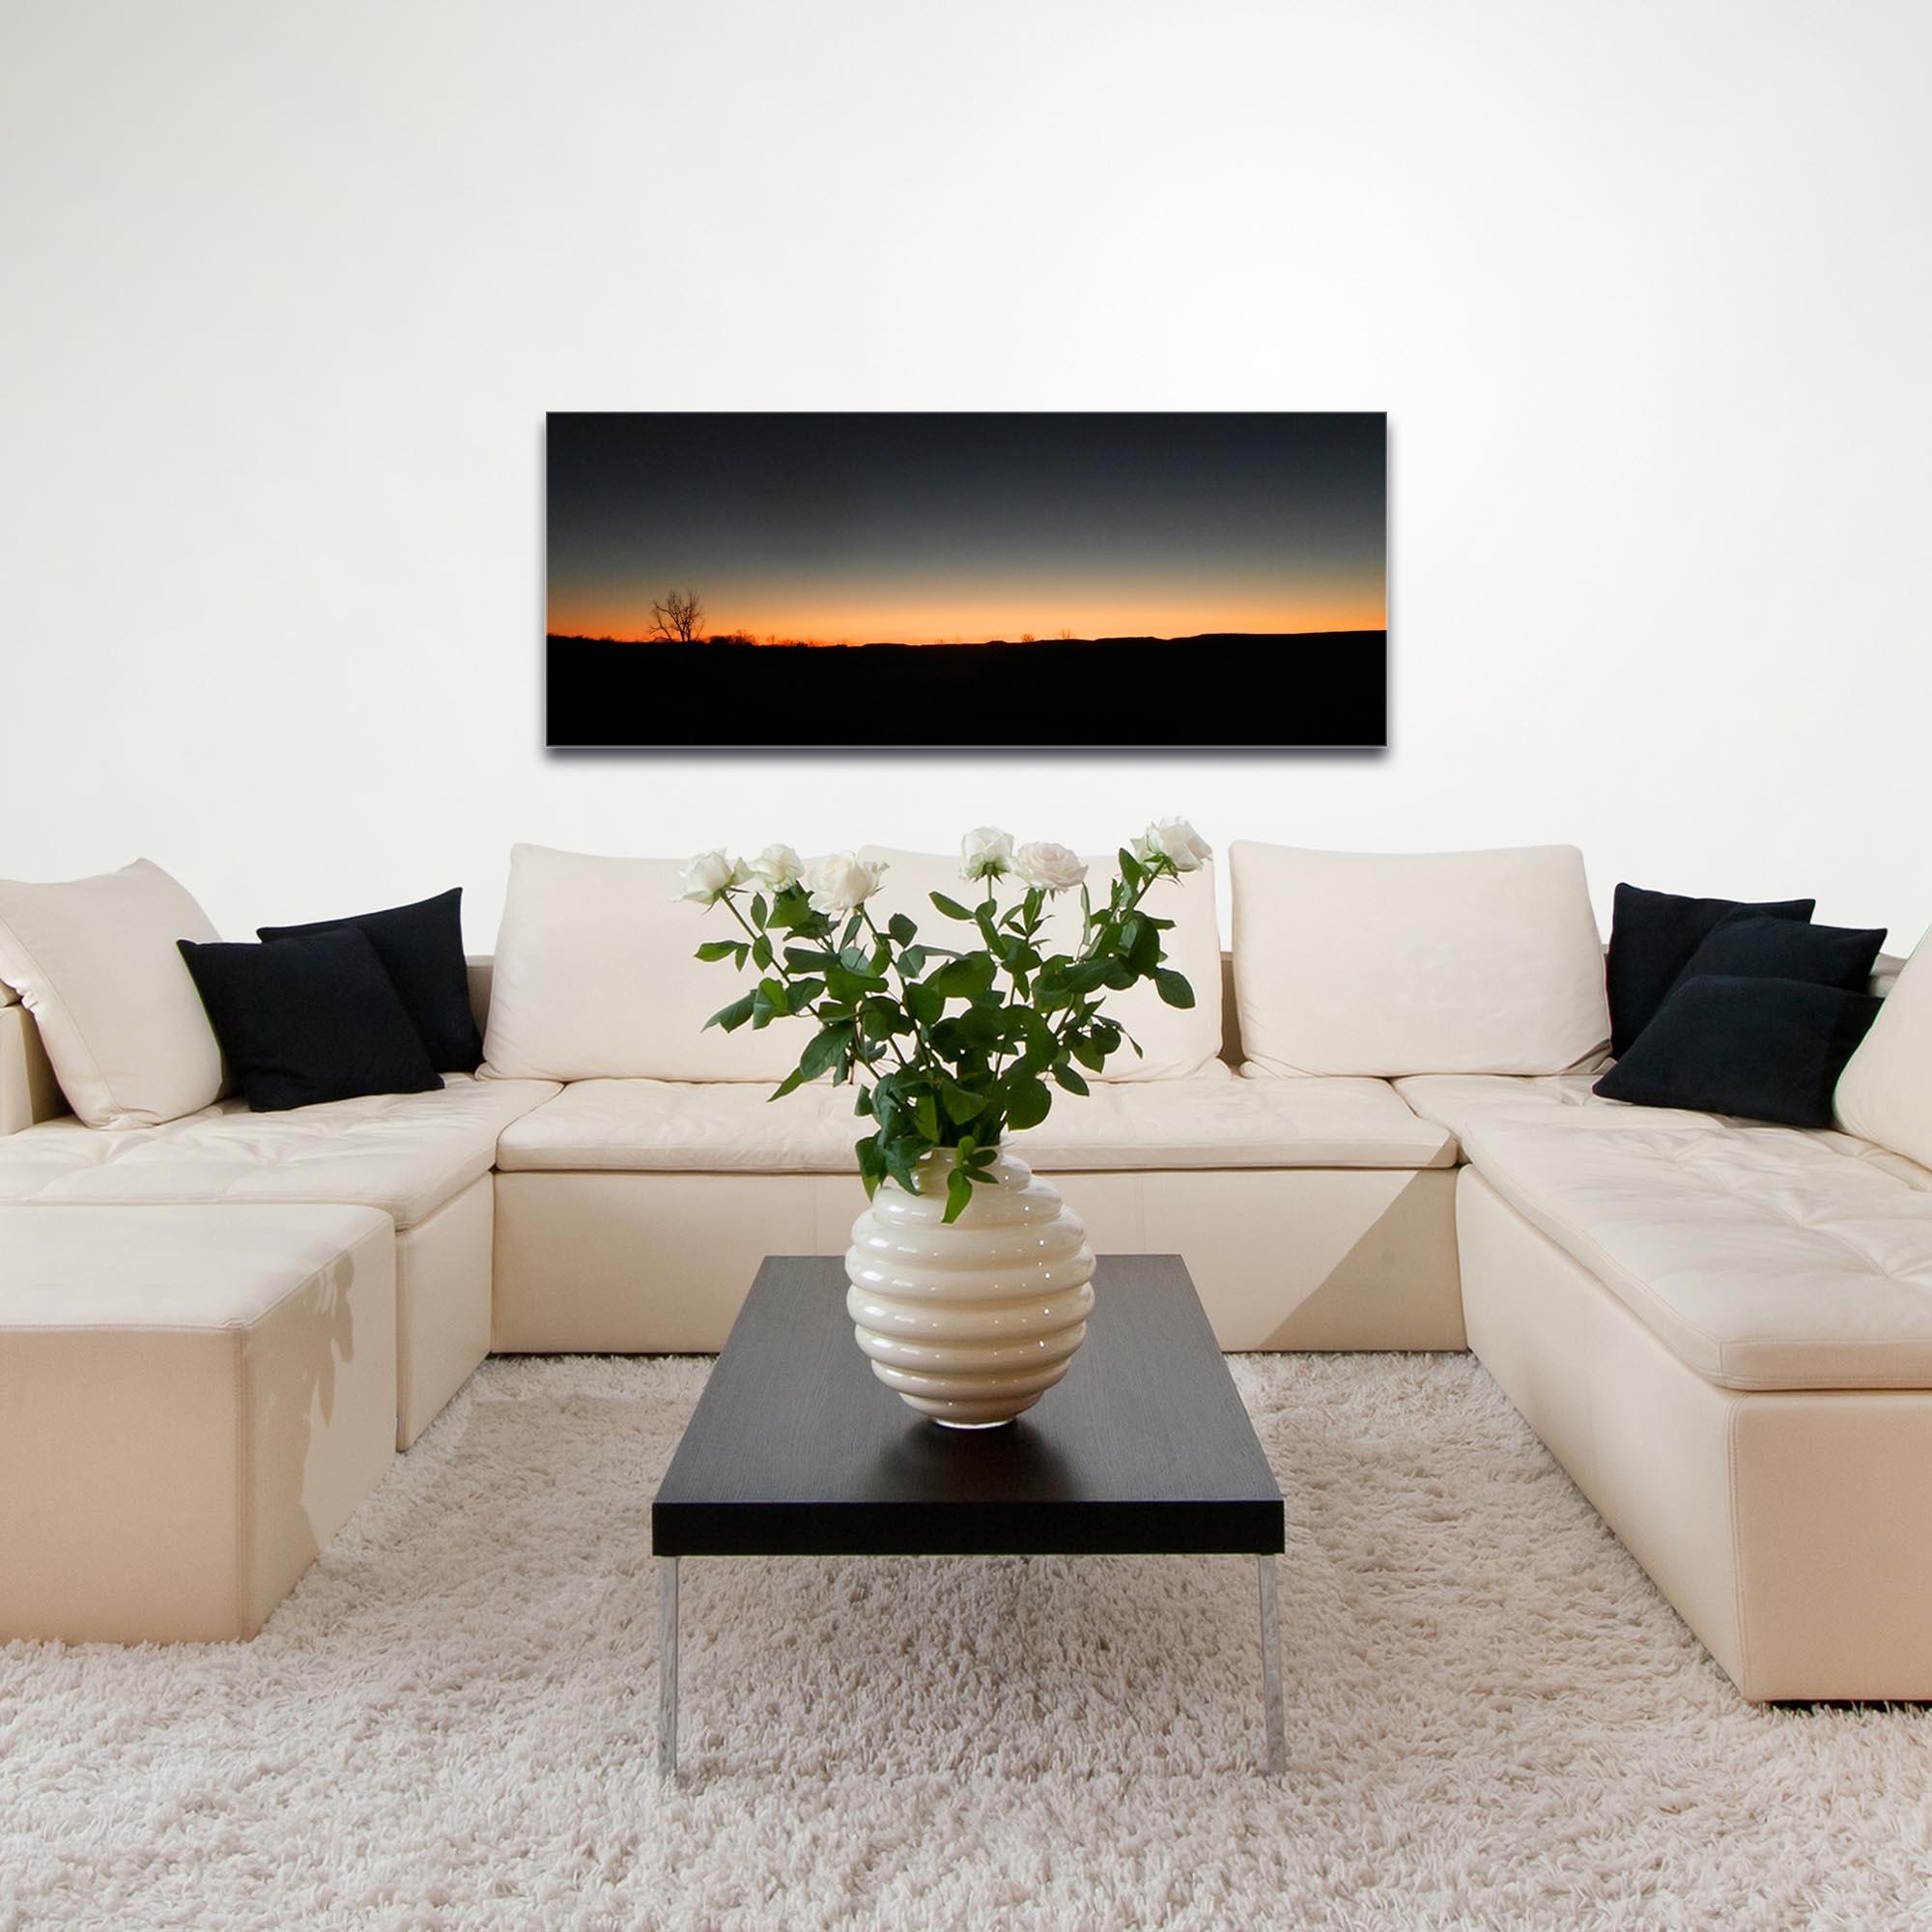 Western Wall Art 'Desert Sunset' - American West Decor on Metal or Plexiglass - Image 3